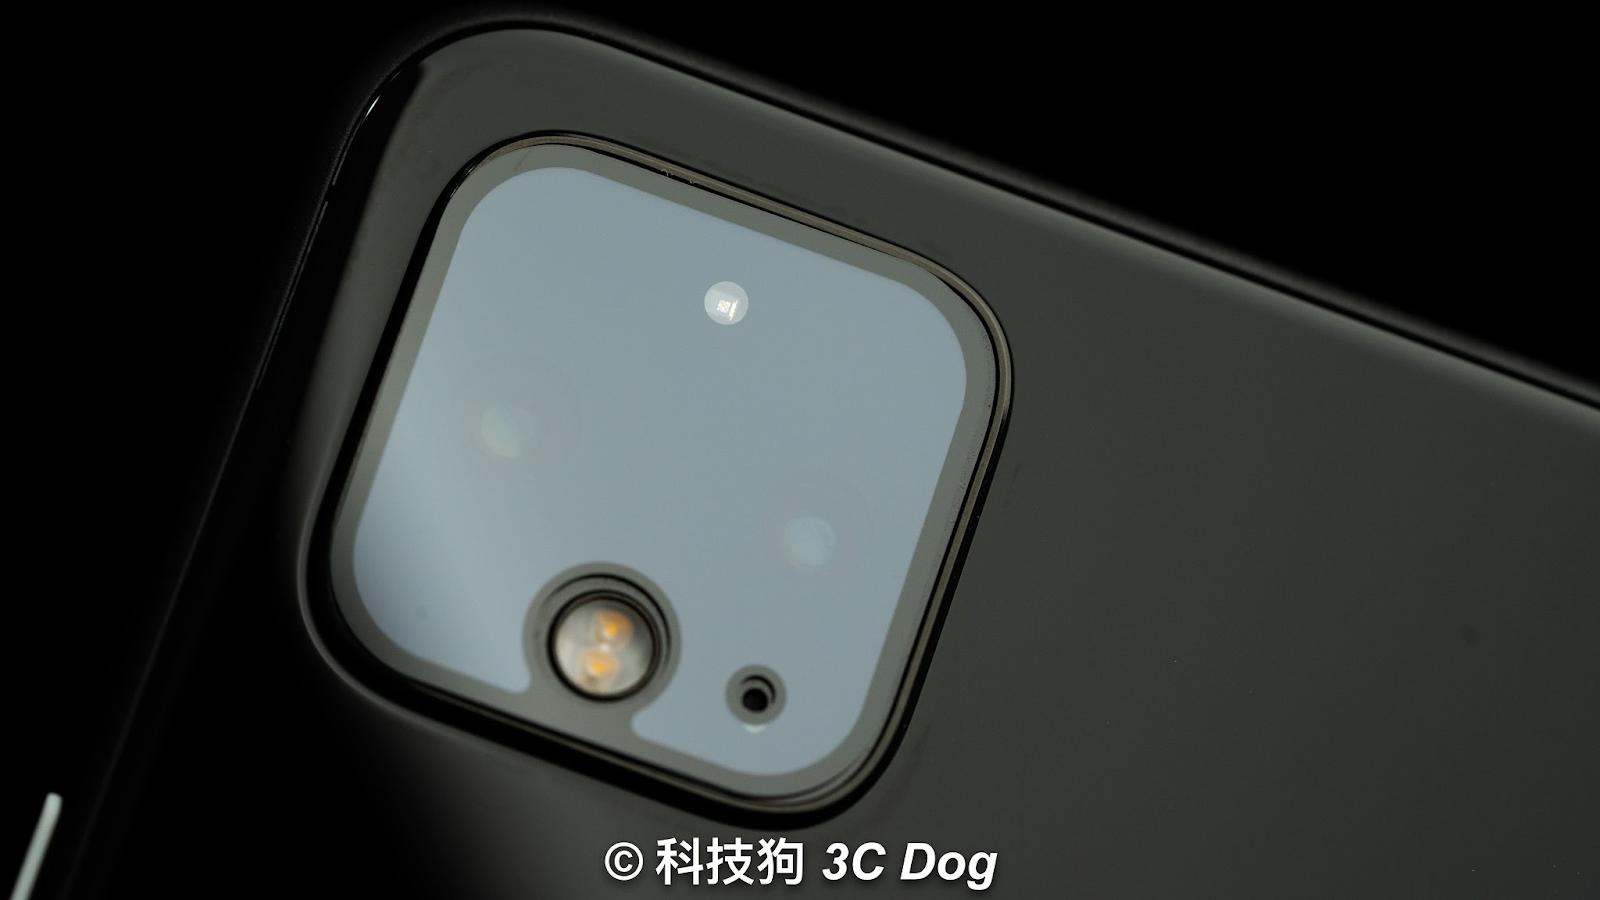 Android 鏡頭保護貼開箱 Galaxy Note10 系列 / Google Pixel 4 系列 / 華為 Mate30 Pro - 11